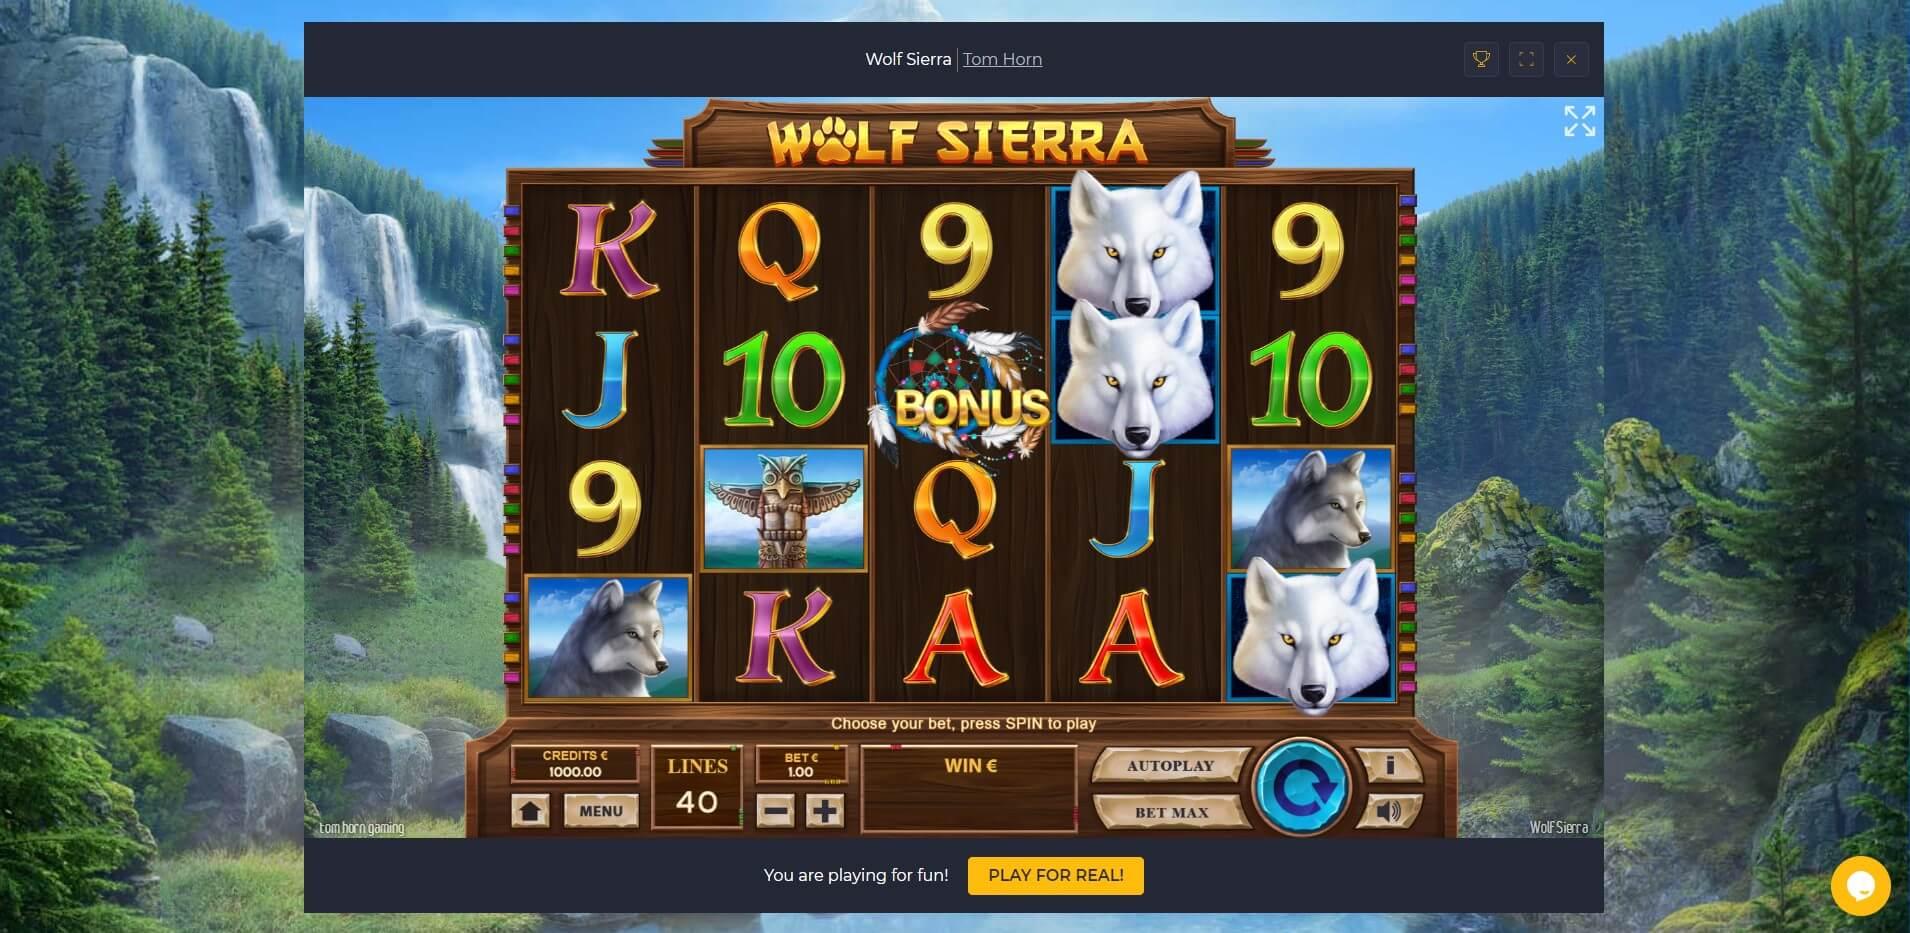 Game Play at RollingSlots Casino